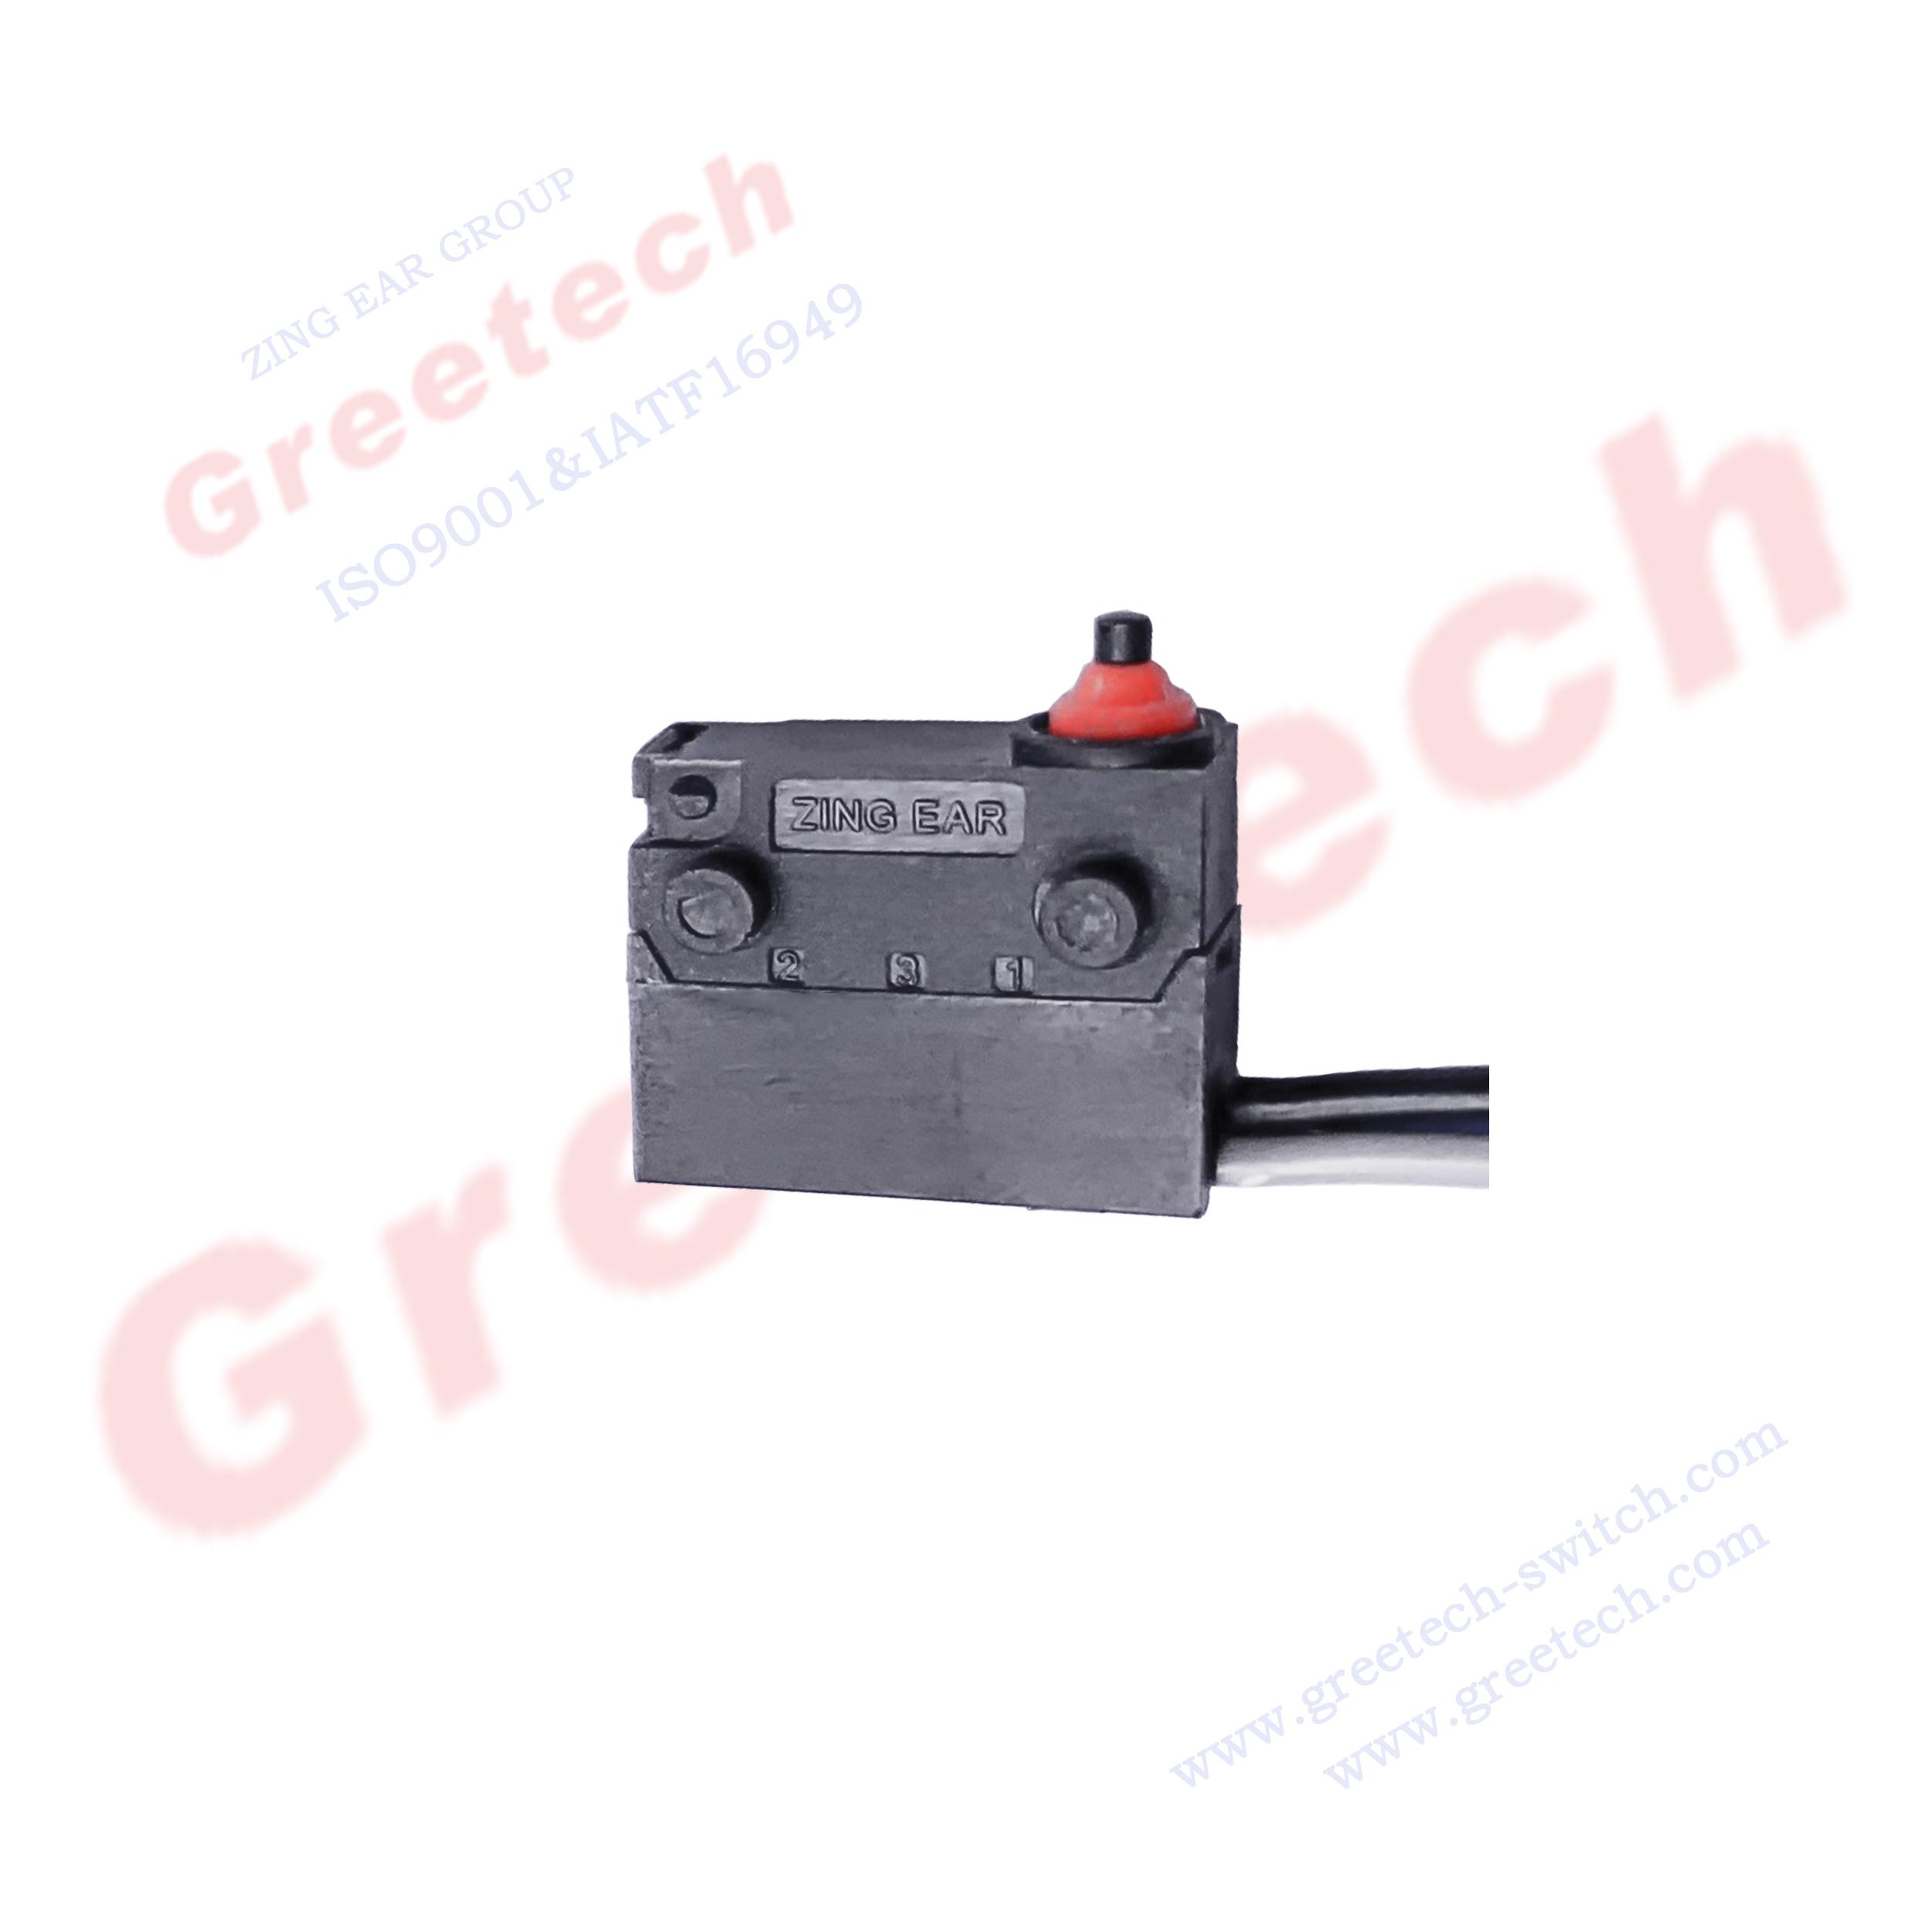 G303-130G00A3B-GF200-T134-3